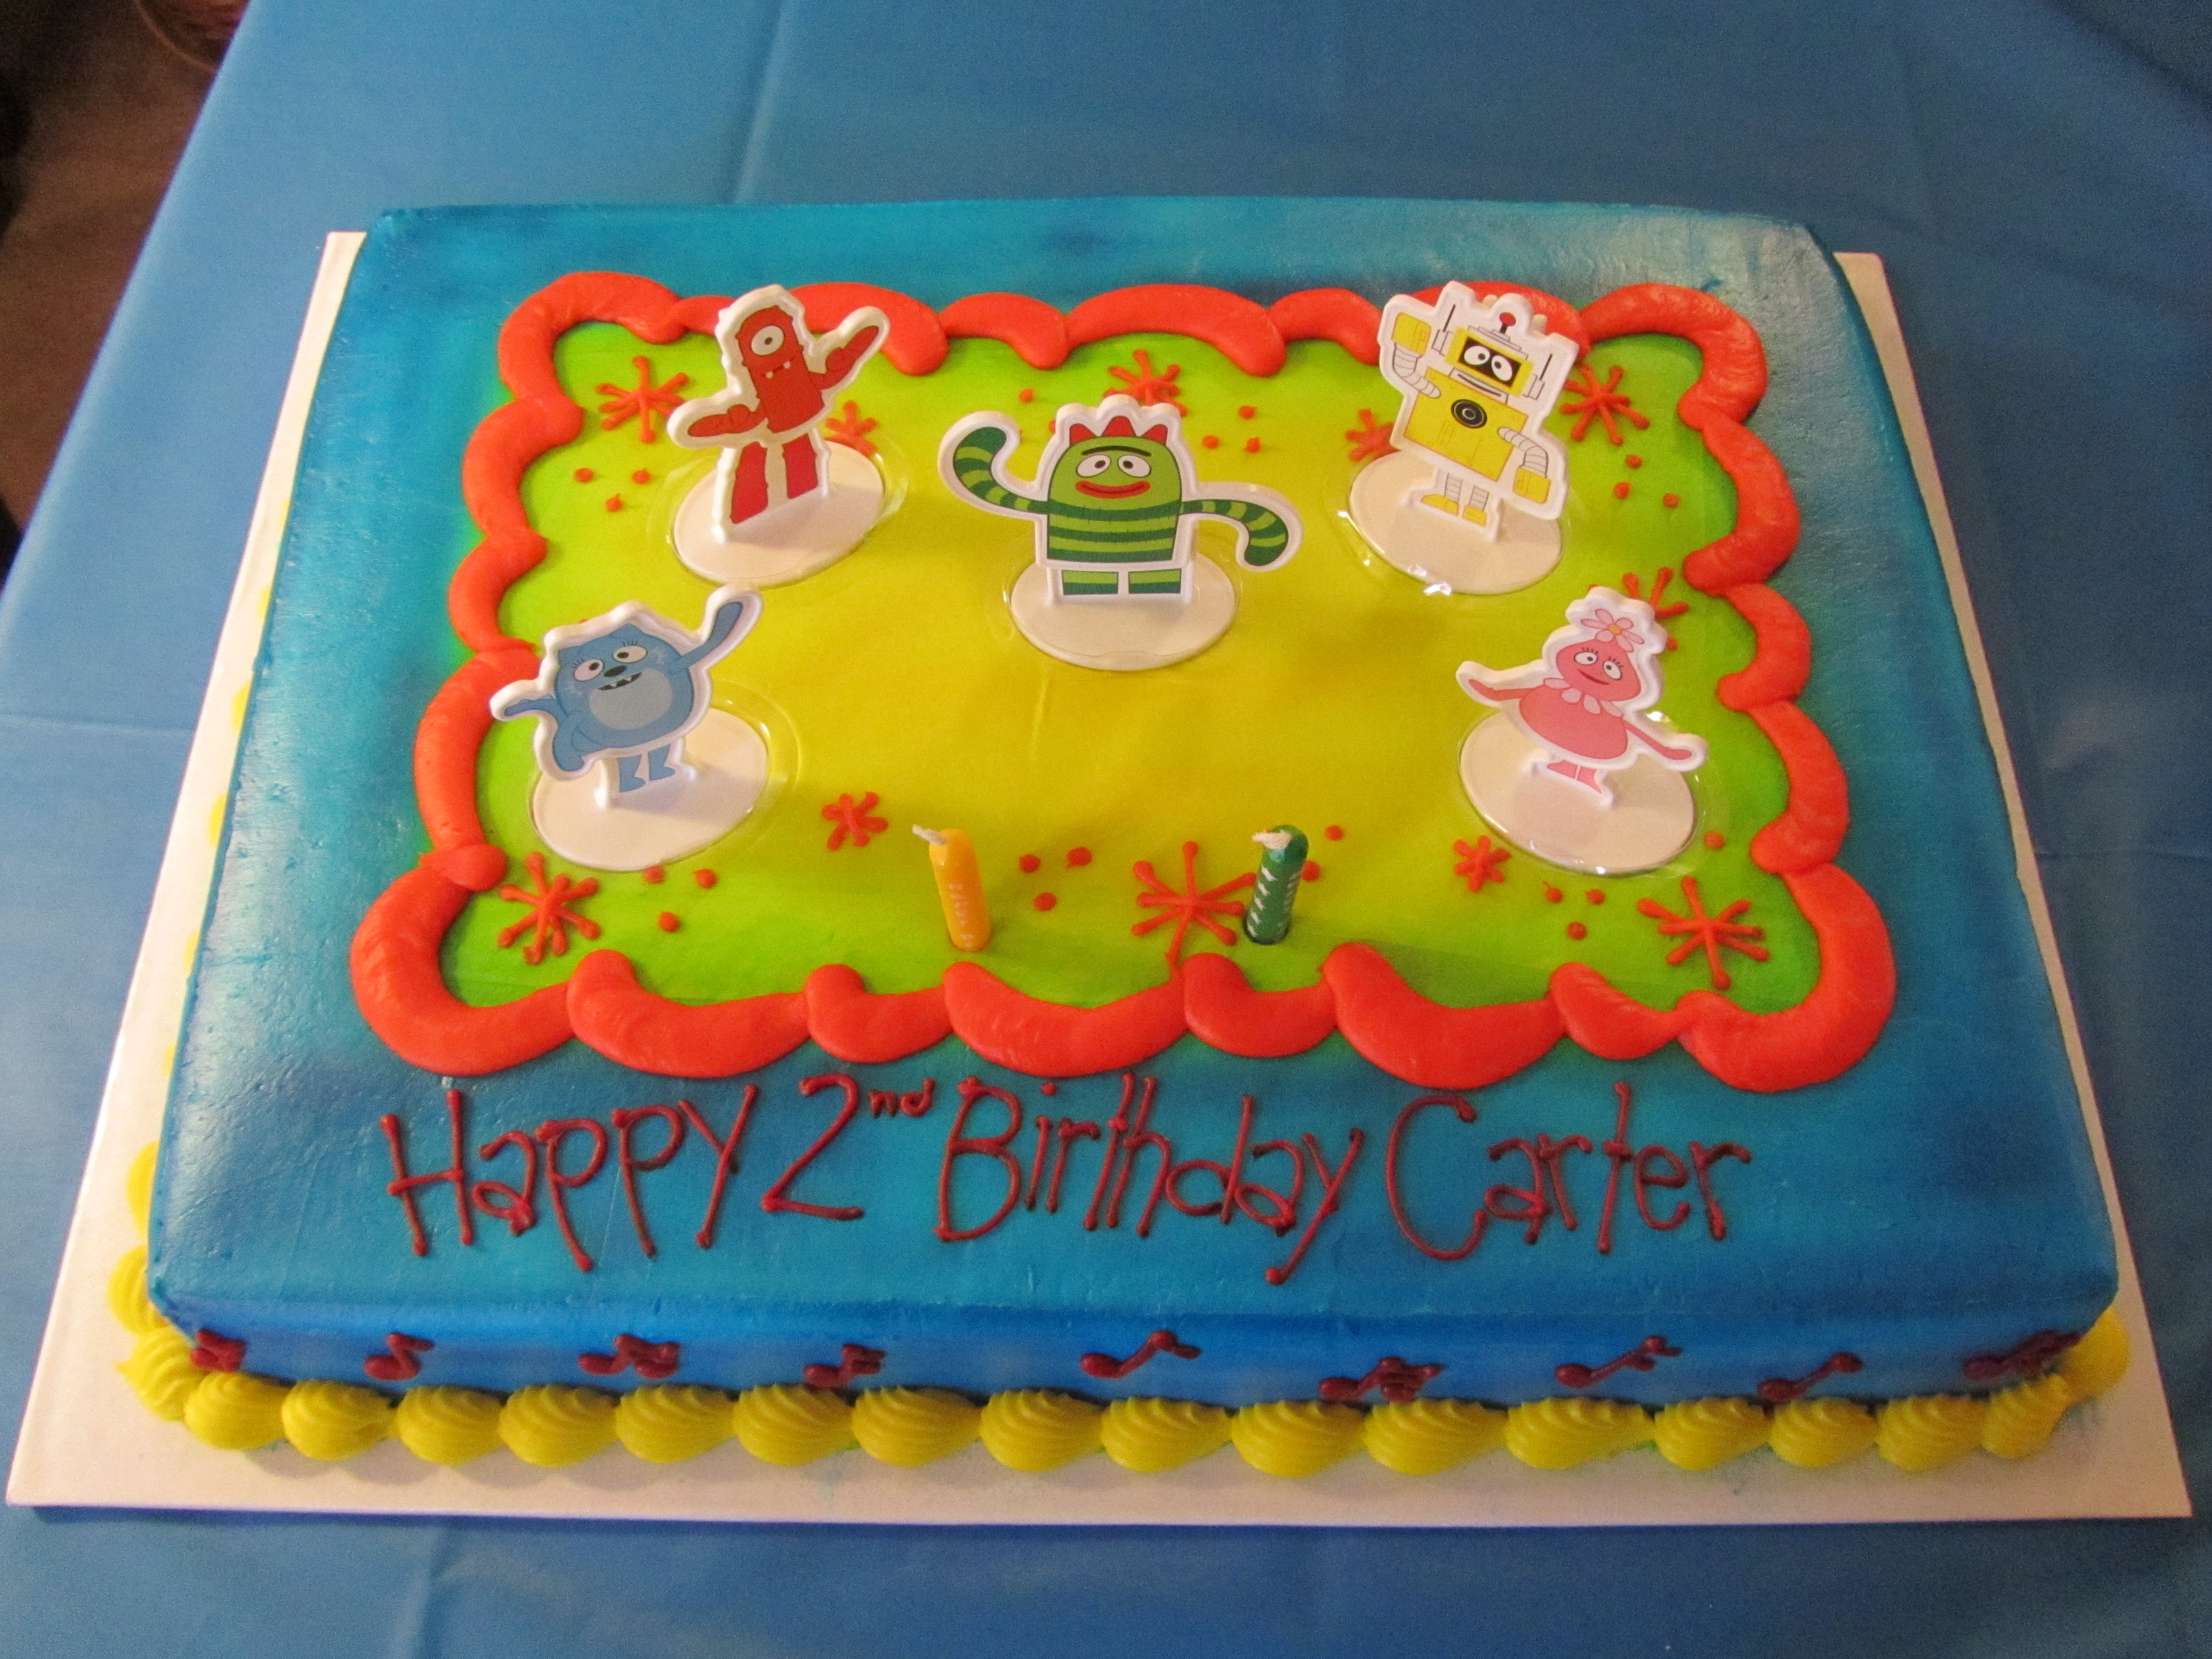 9 Target Bakery Custom Cakes Photo Target Bakery Birthday Cake